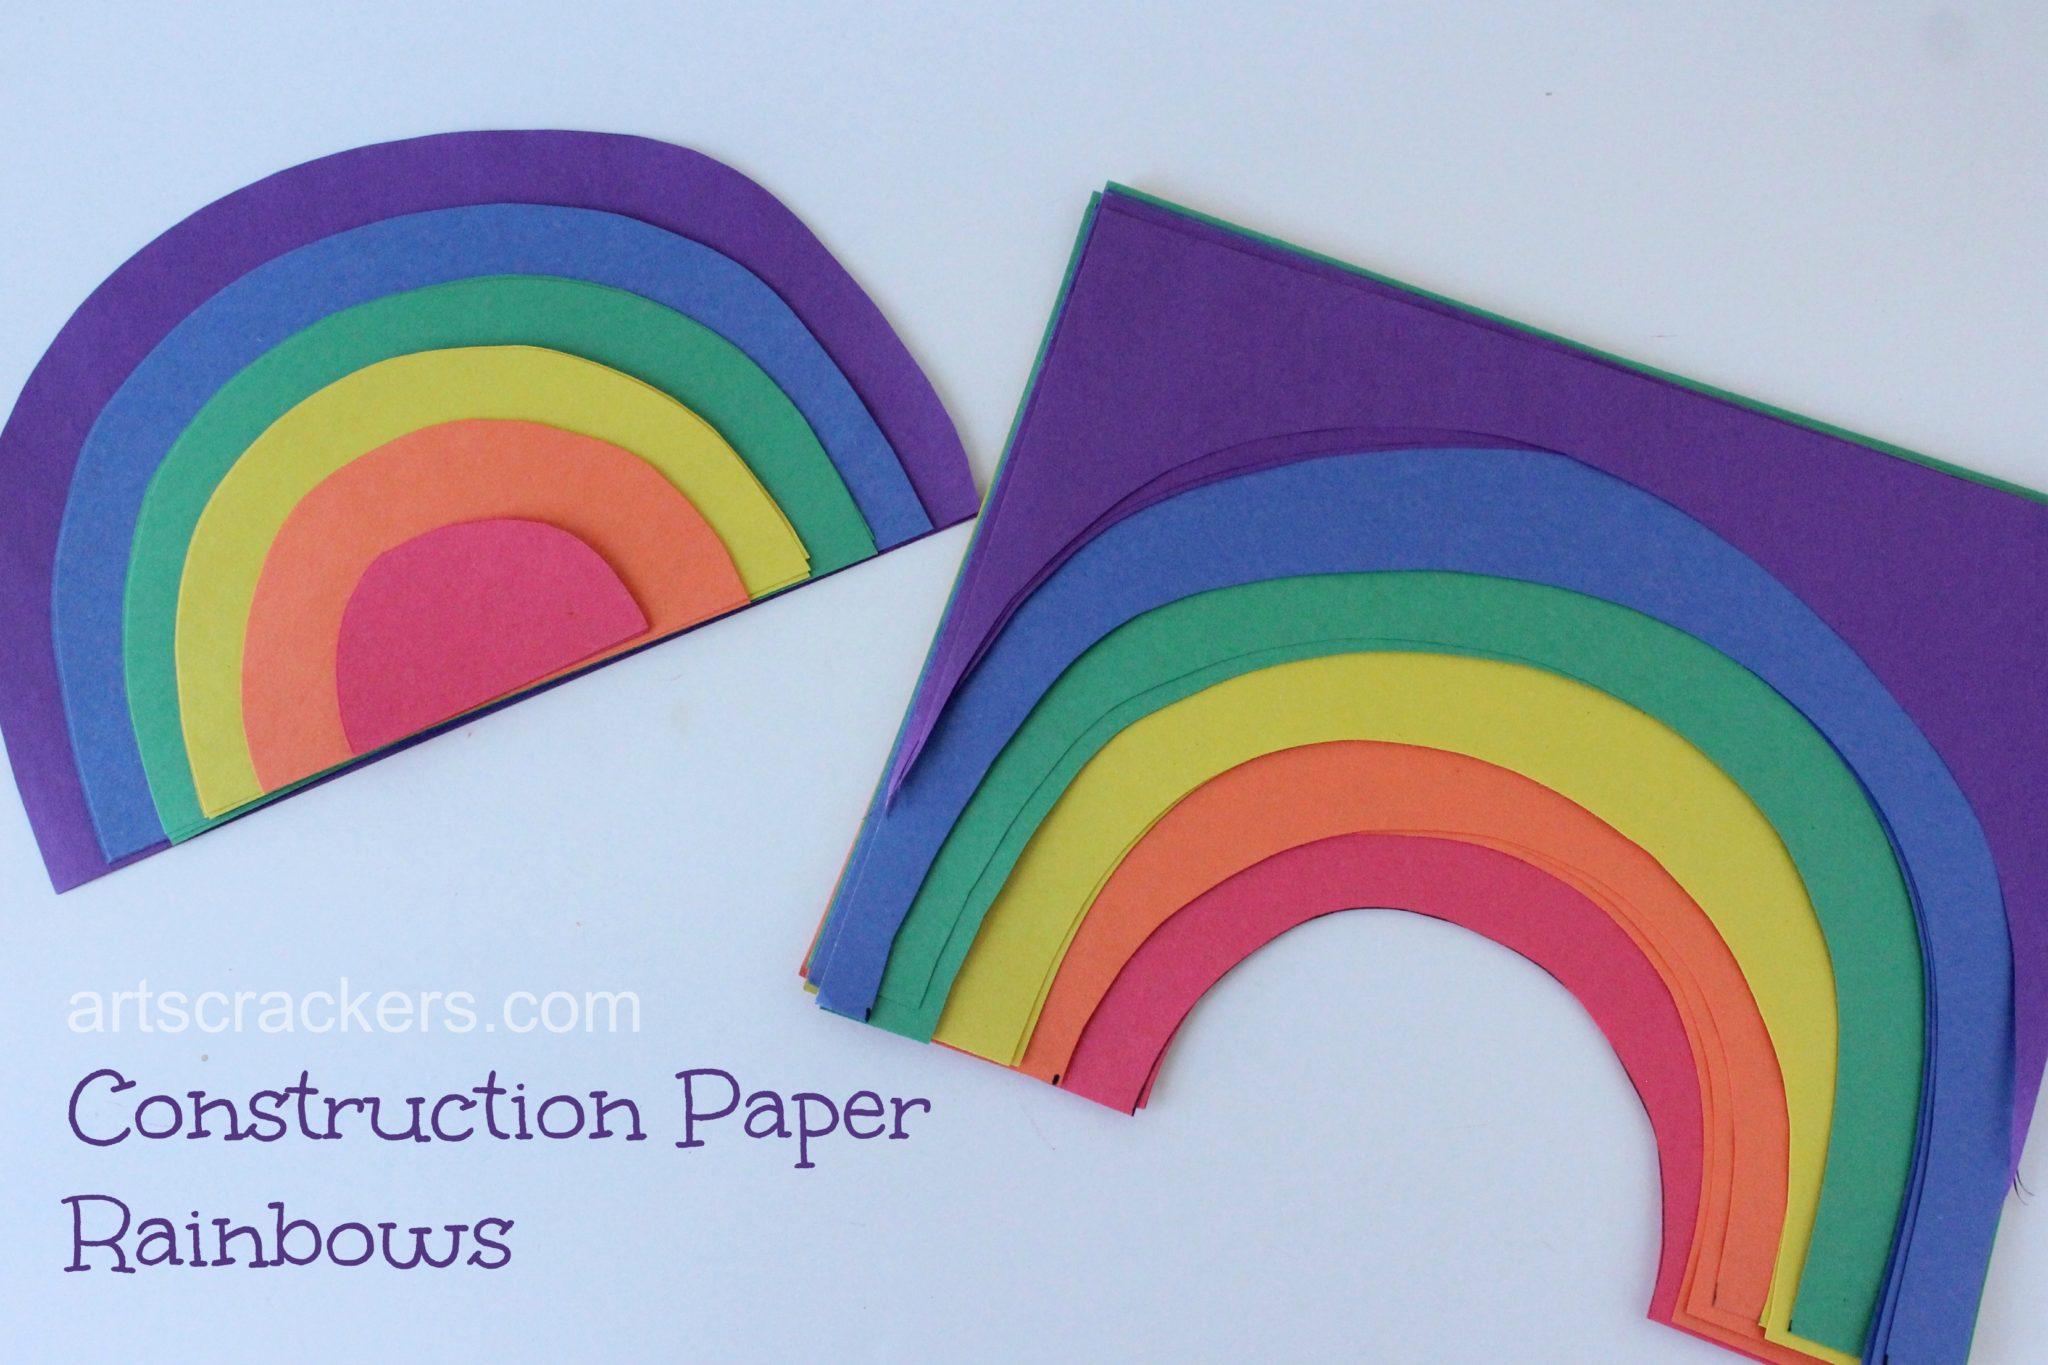 Construction Paper Rainbows